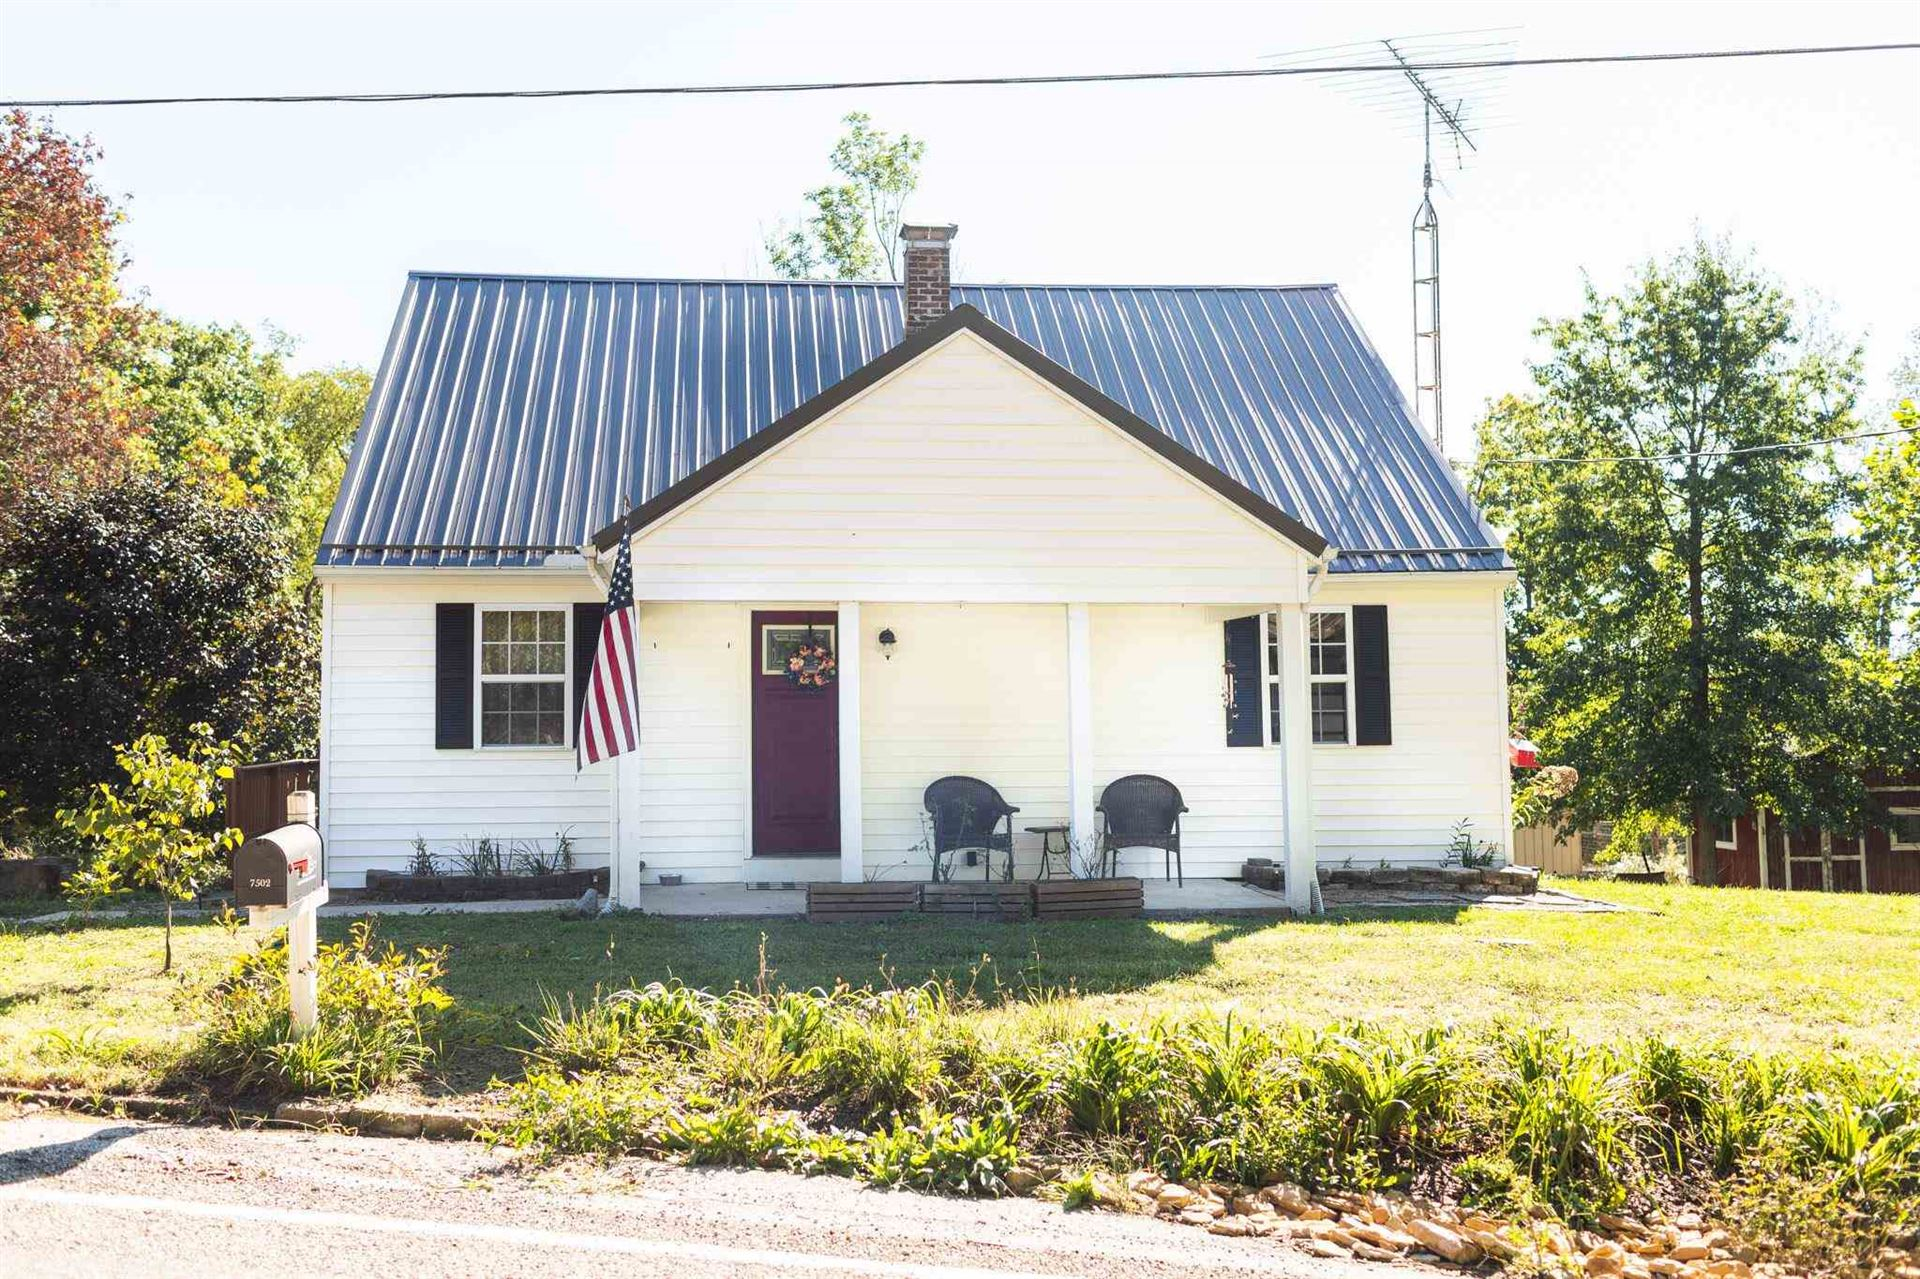 7502 N State Road 43                                                                               Solsberry                                                                      , IN - $189,000